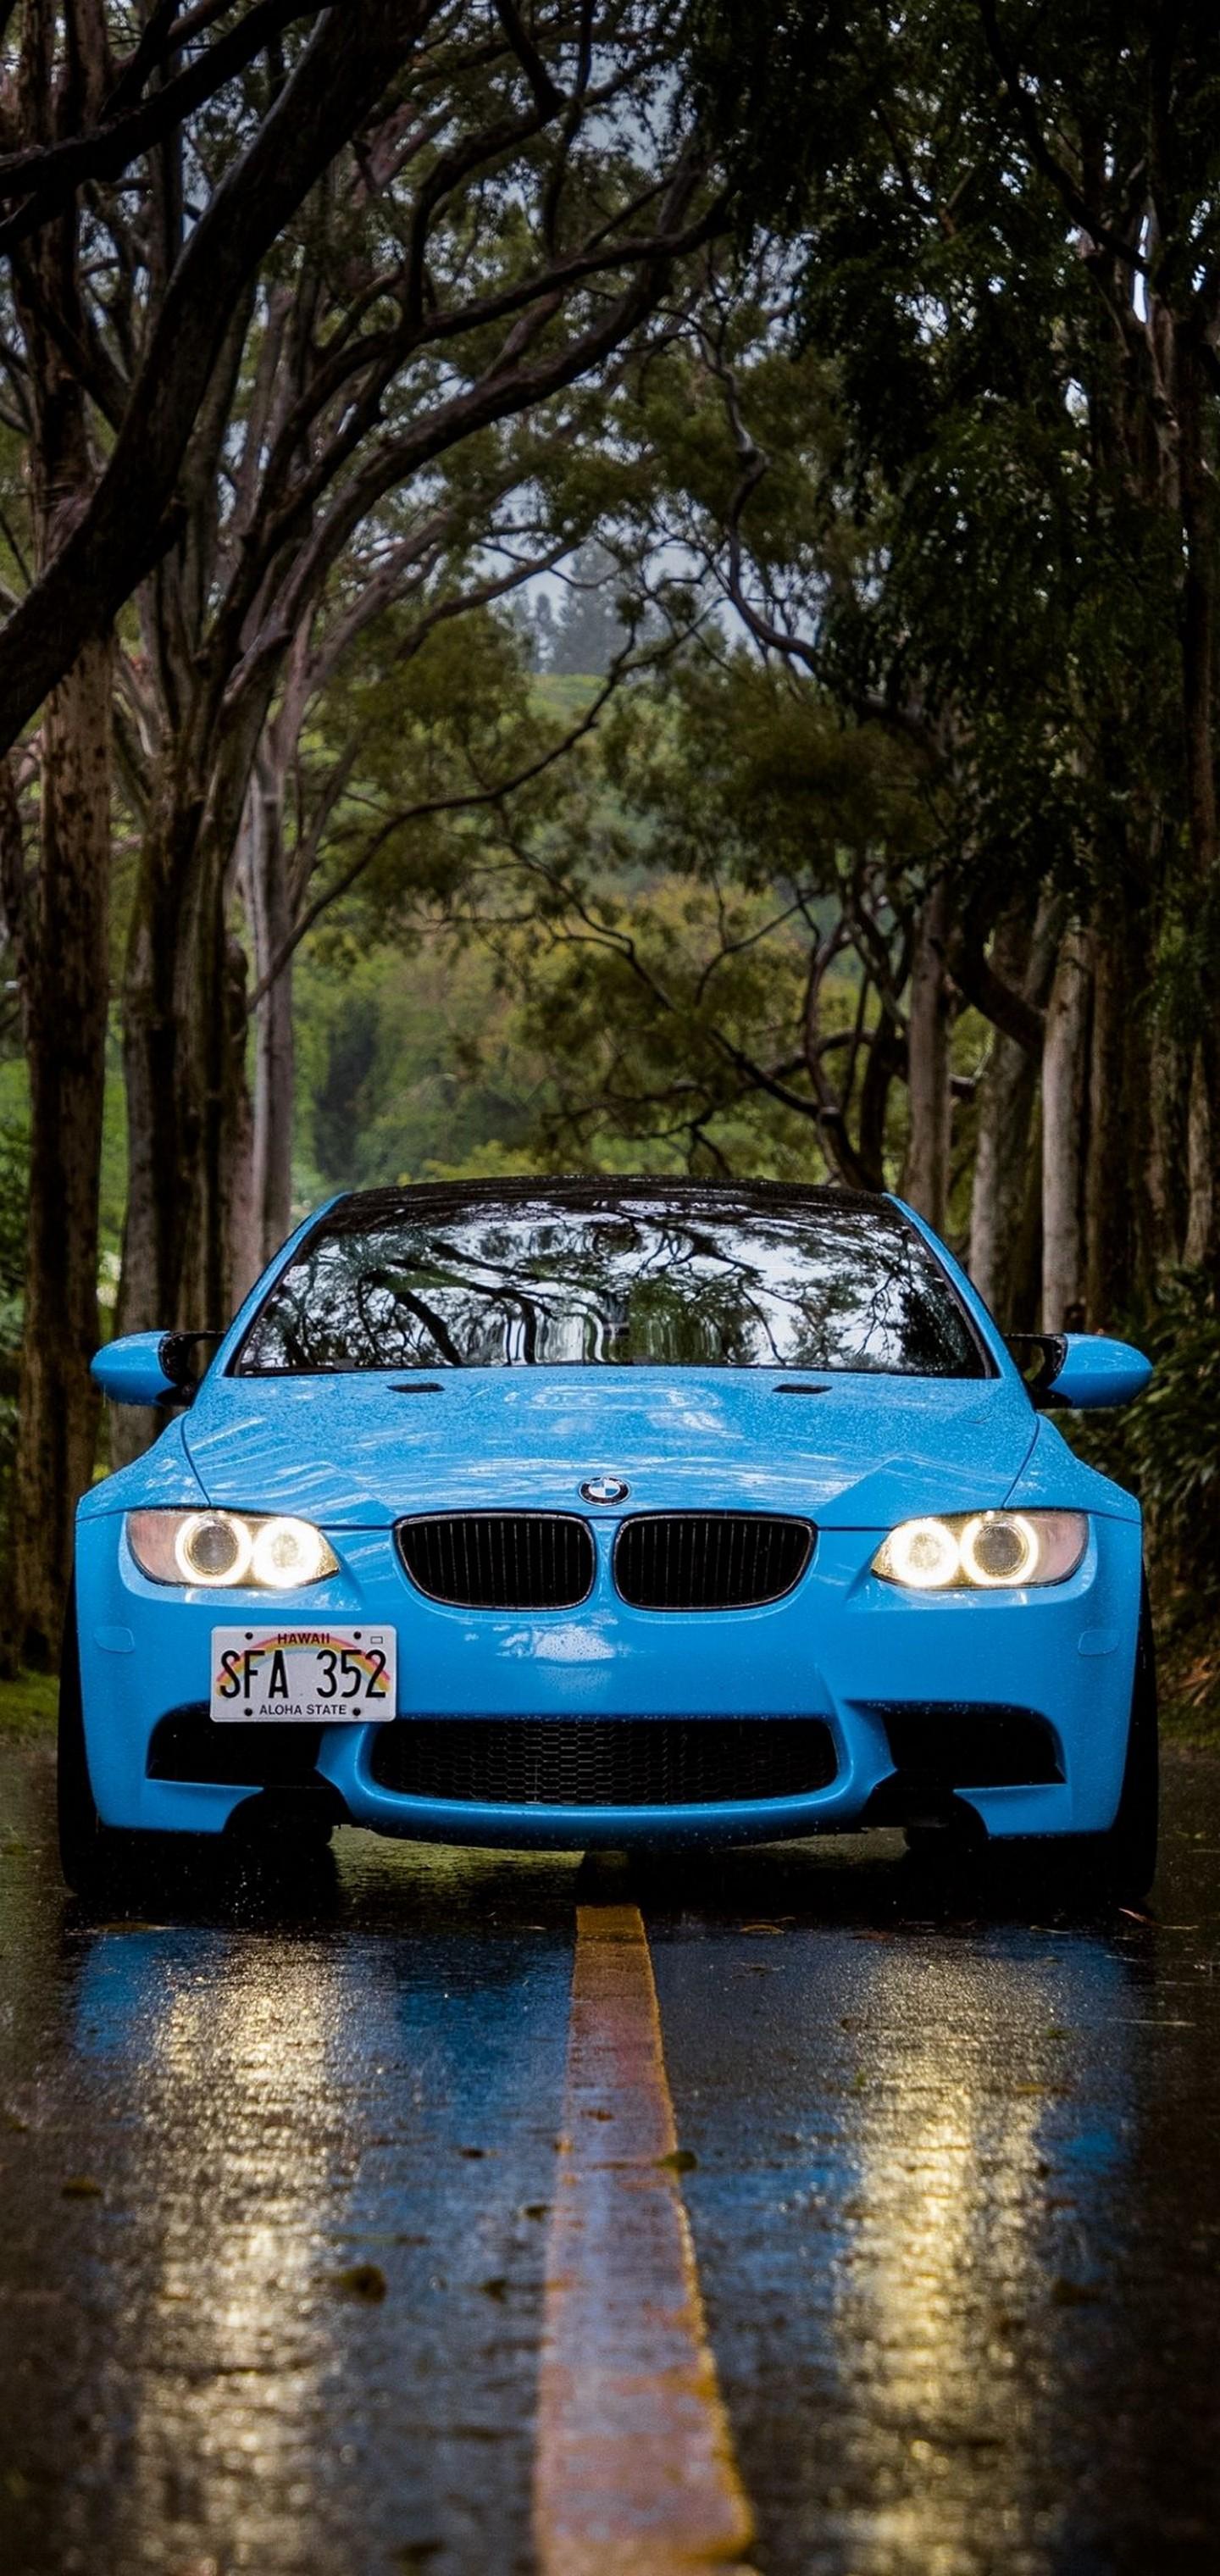 Car Wallpaper Windows 7: Blue BMW 5 Car Wallpaper